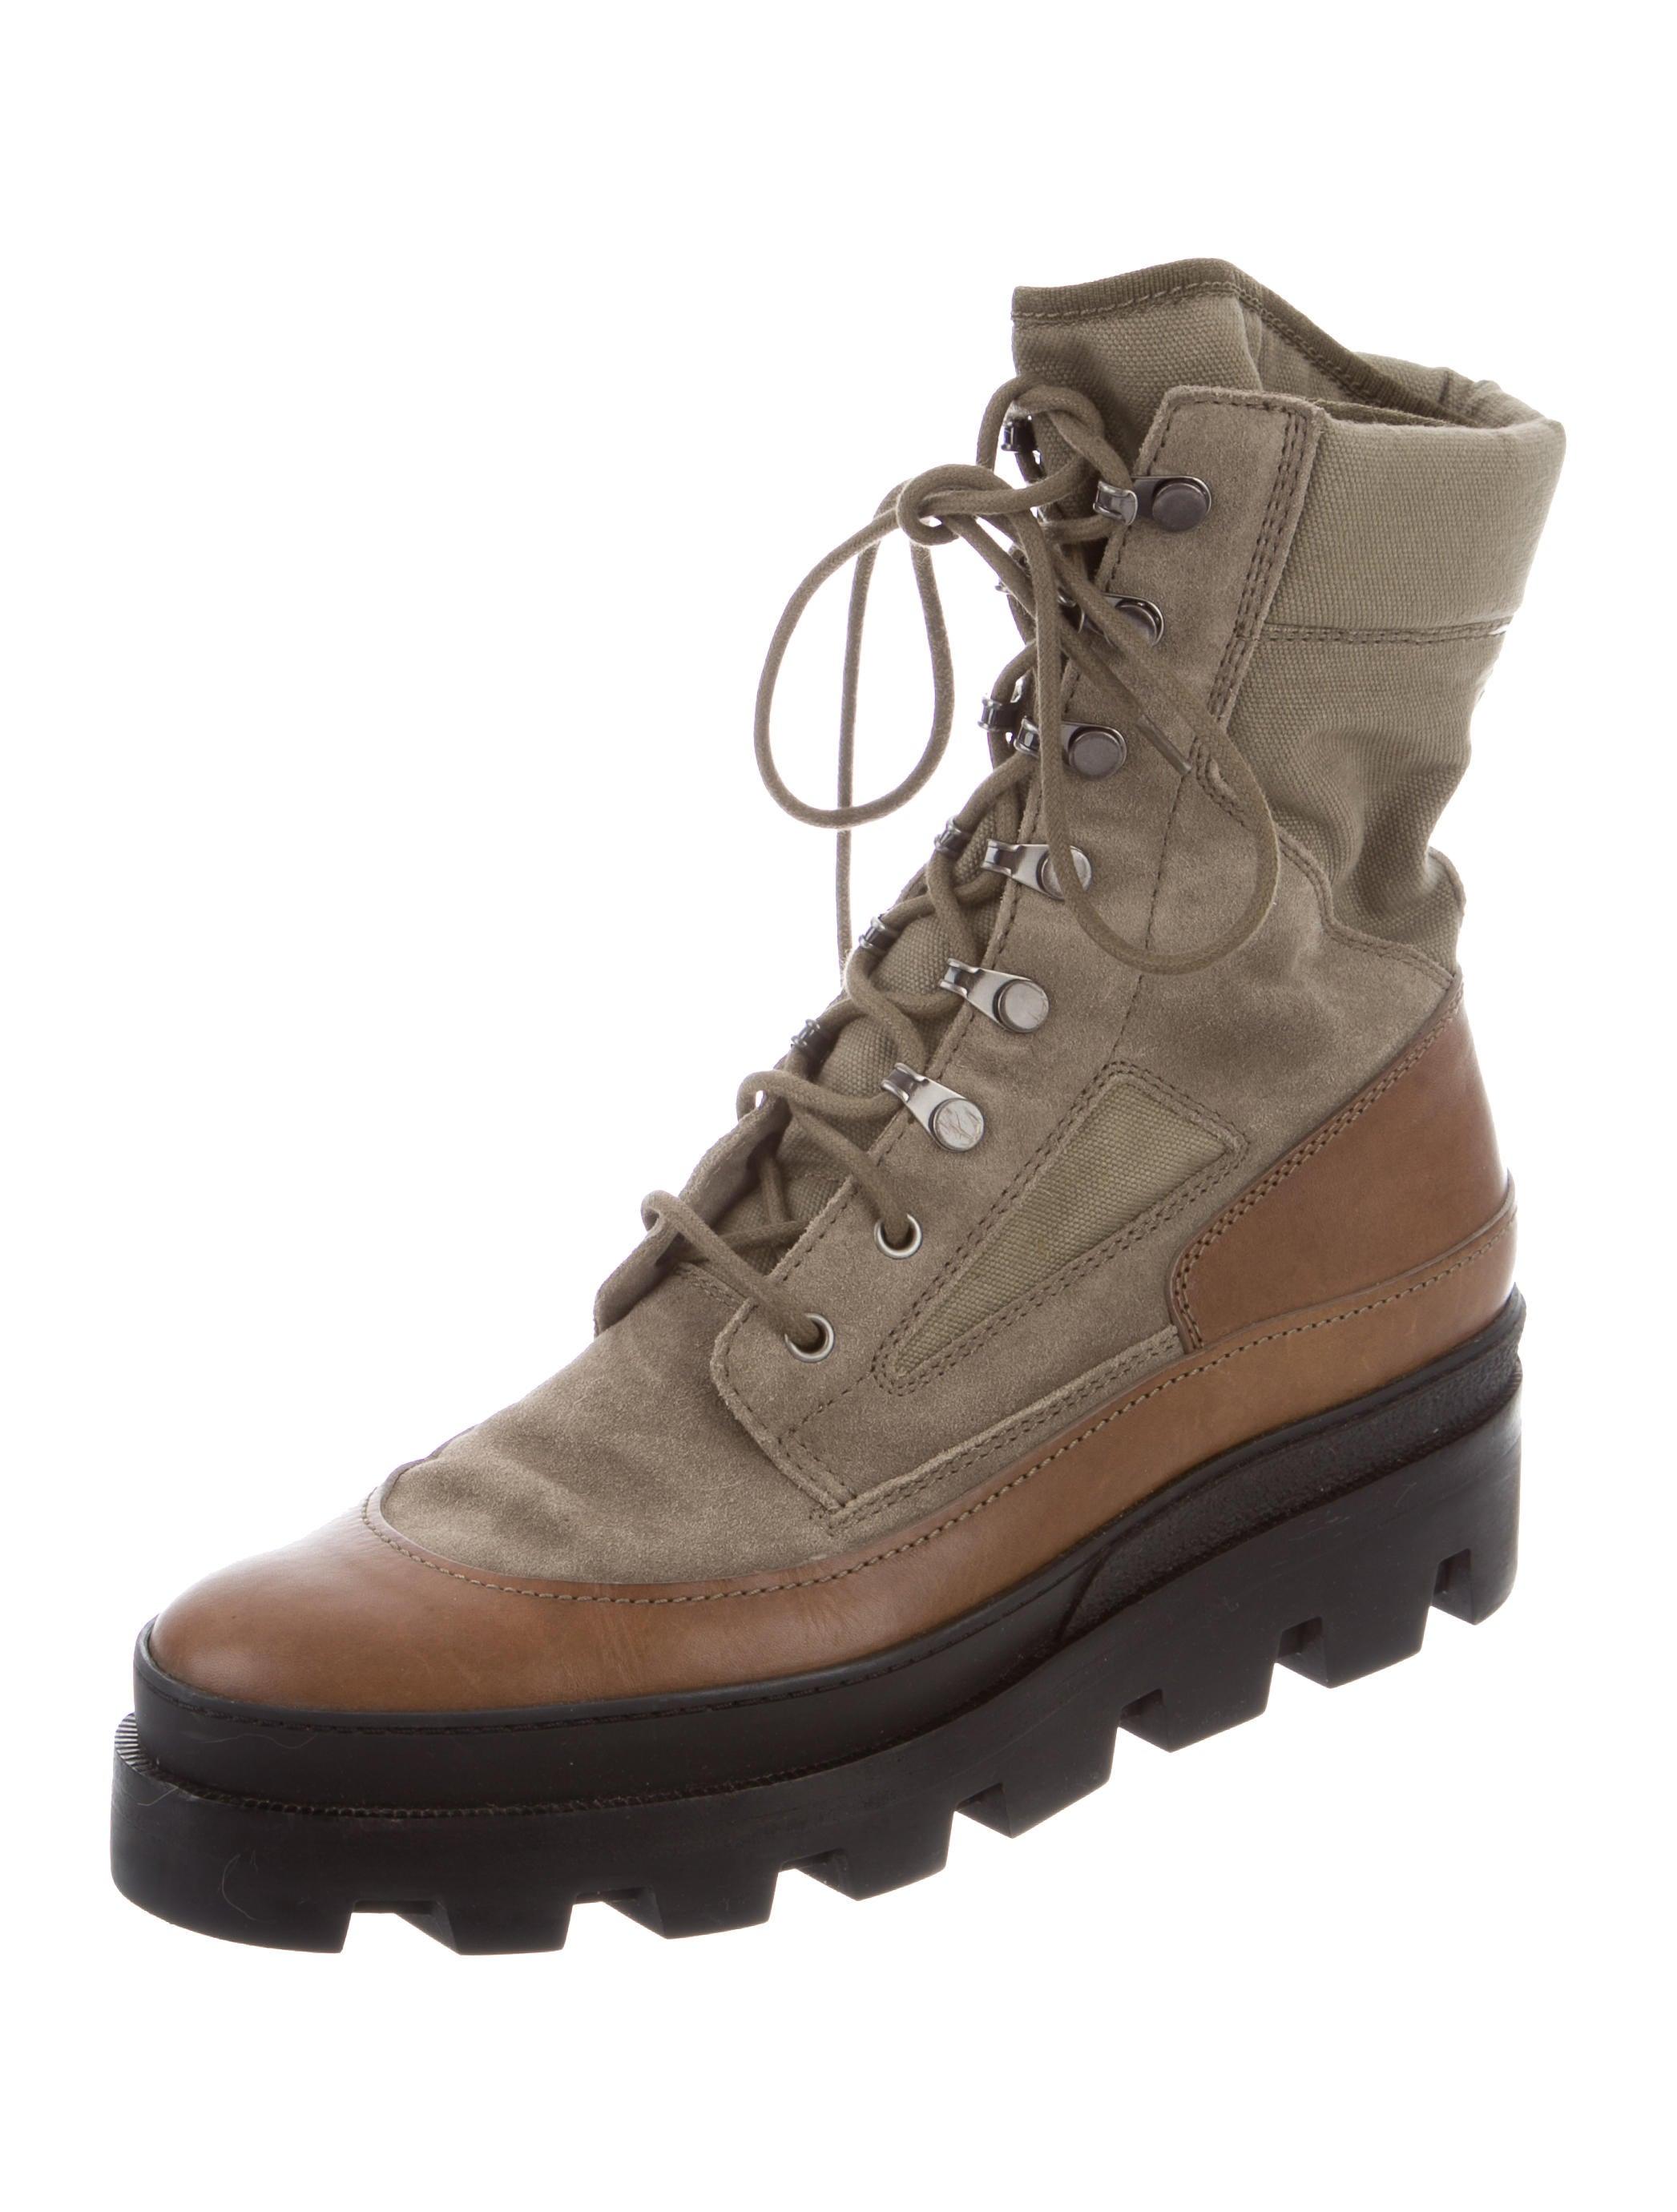 balenciaga leather trimmed platform boots shoes